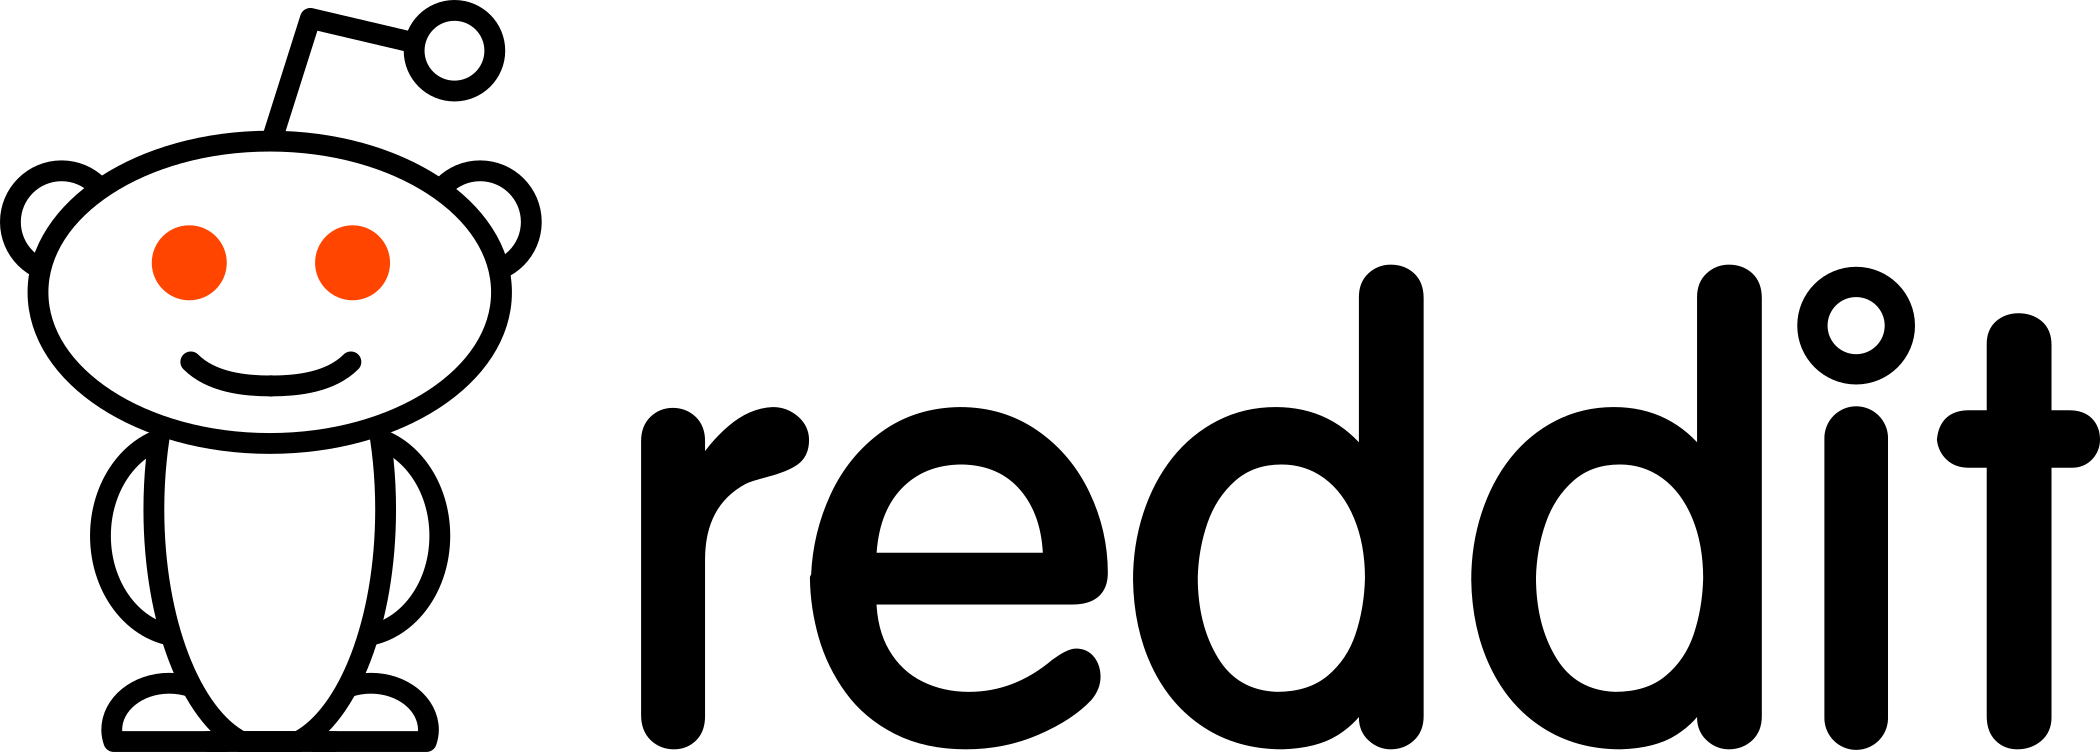 reddit logo 3 - Reddit Logo